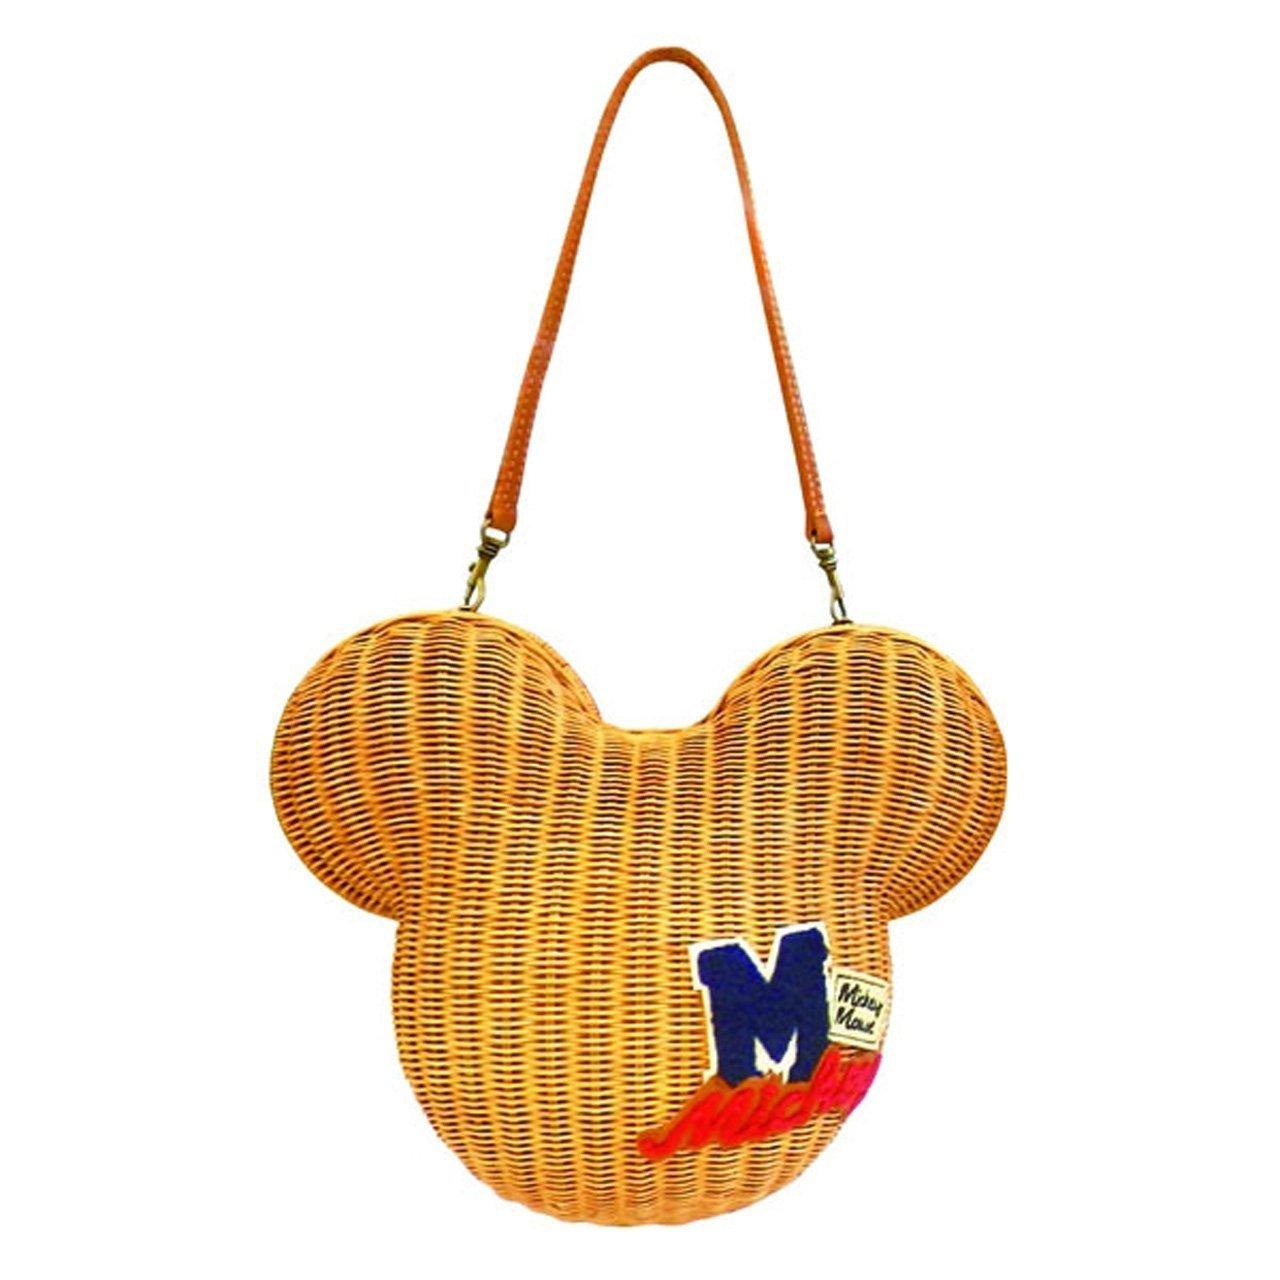 DISNEY Mickey mouse Camel Rattan Mascot Face Shoulder Bag Handbag from Japan FS